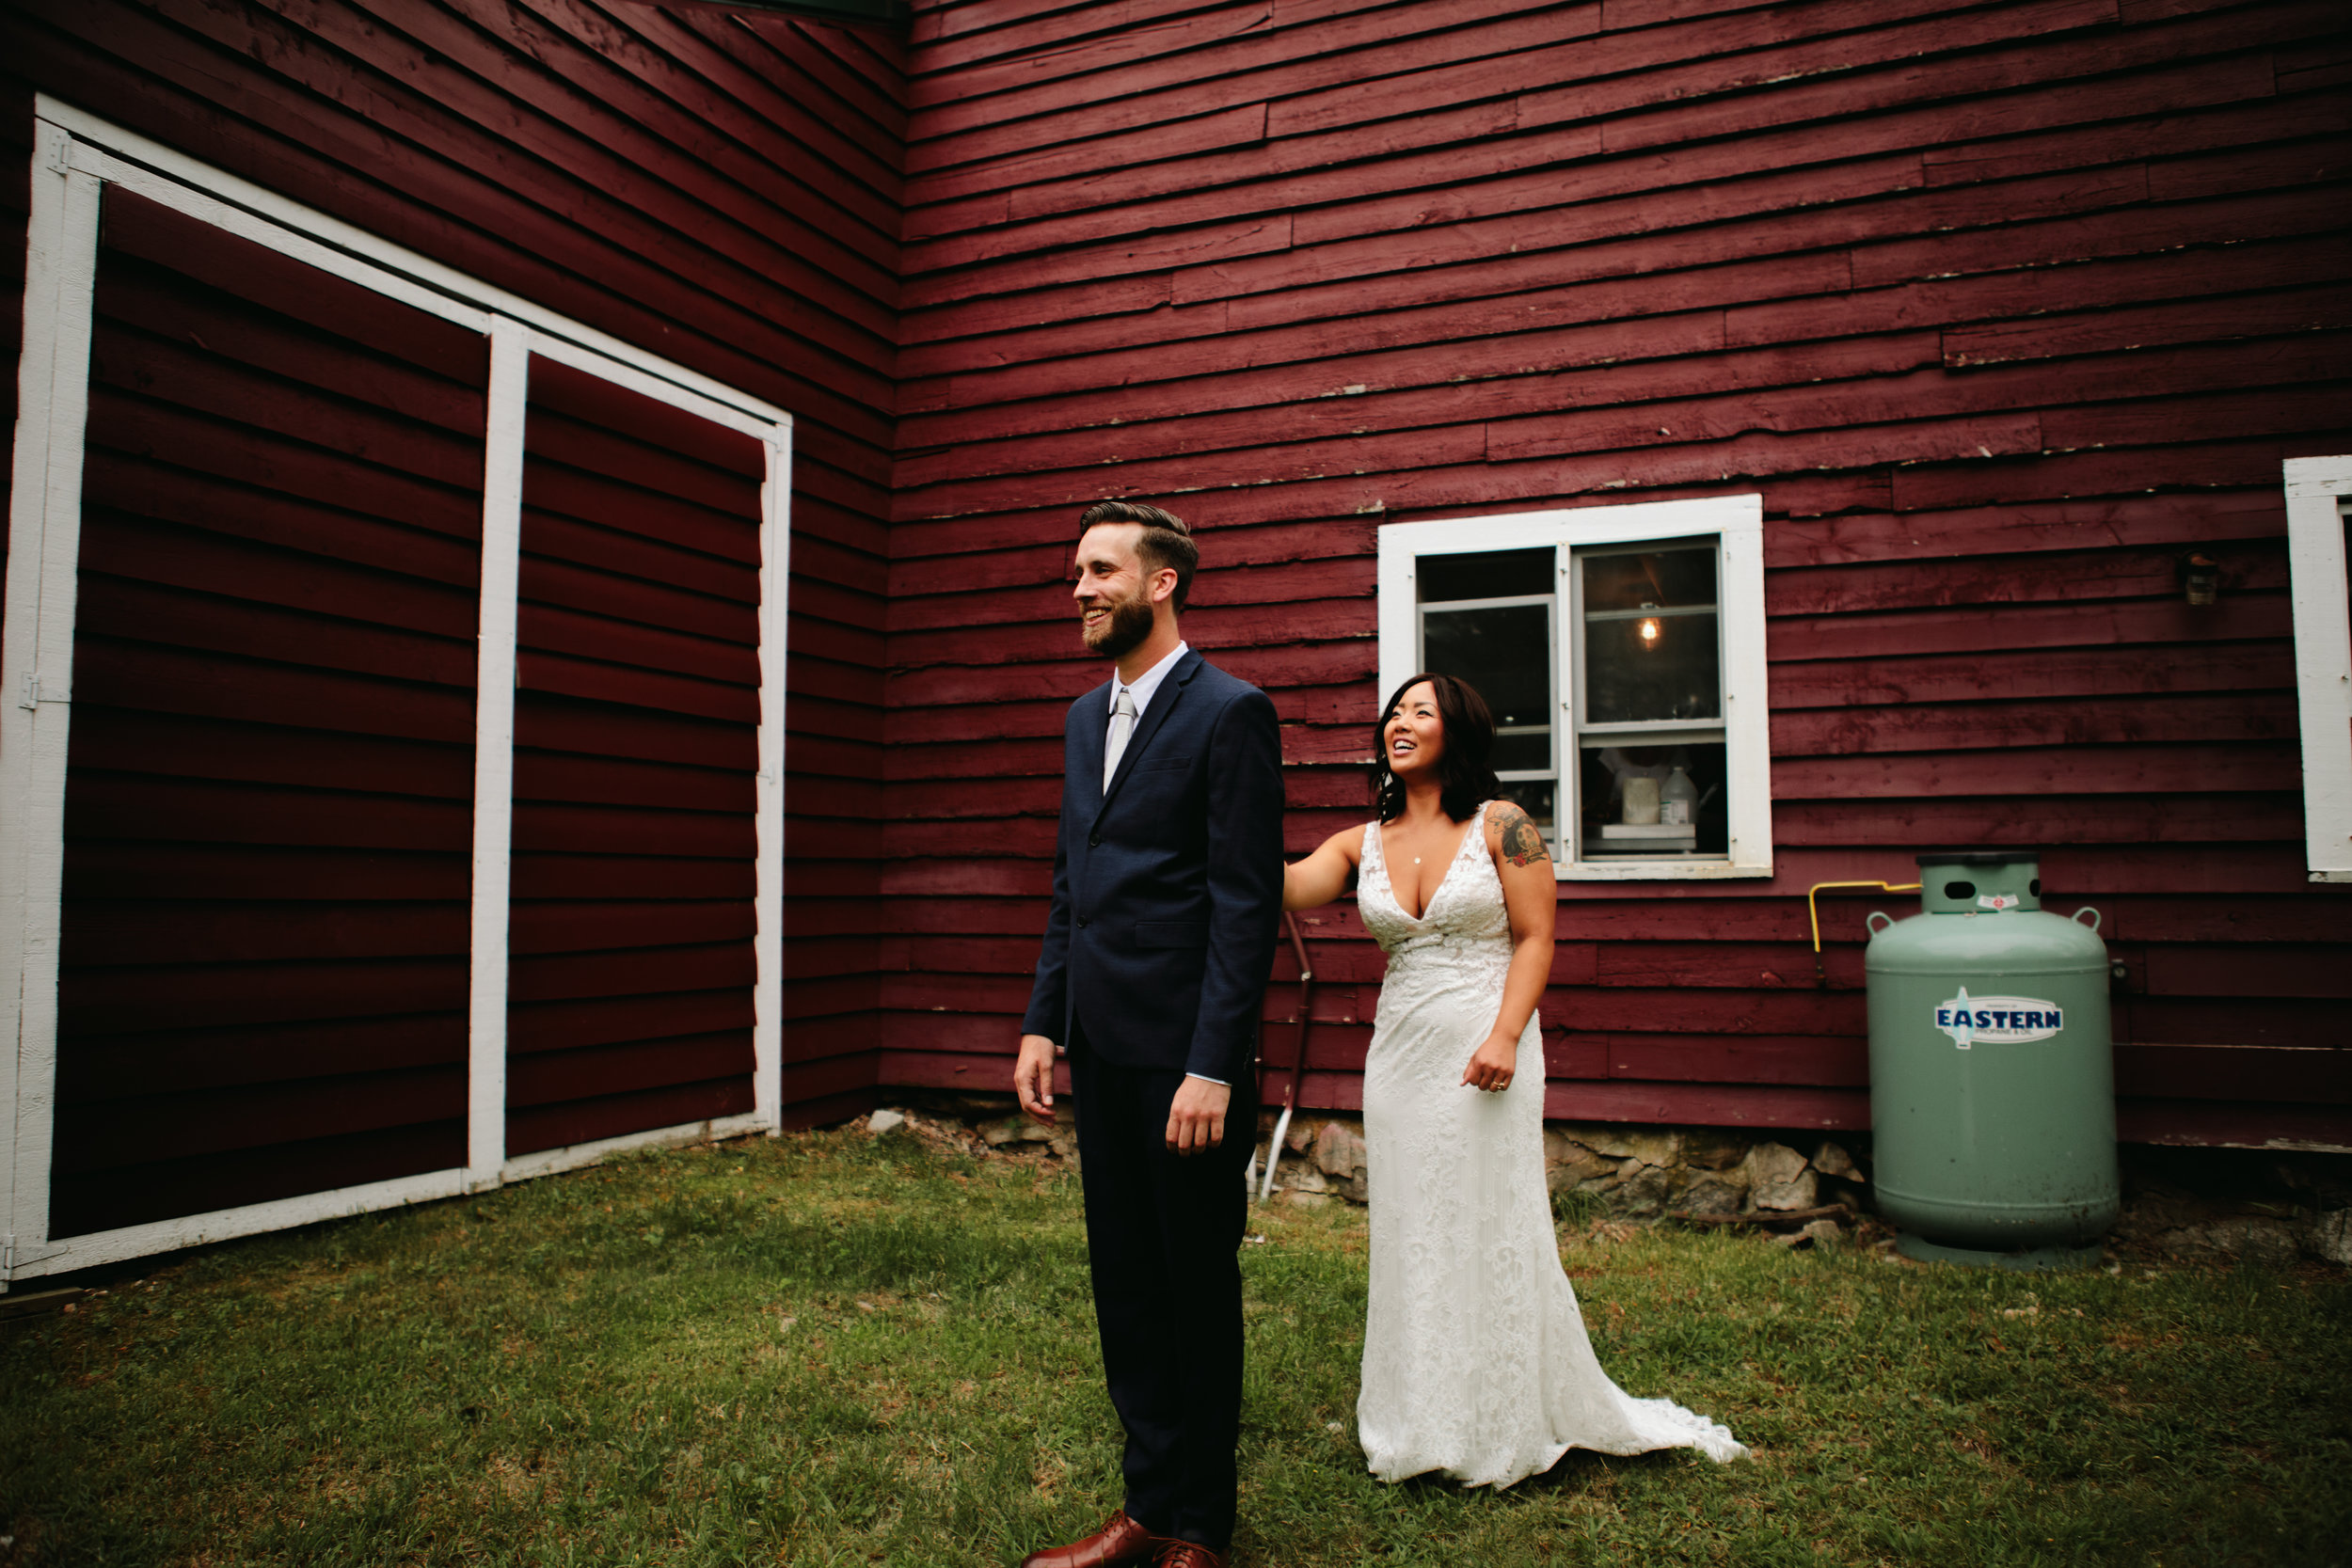 tumbledown-farms-wedding-5.jpg